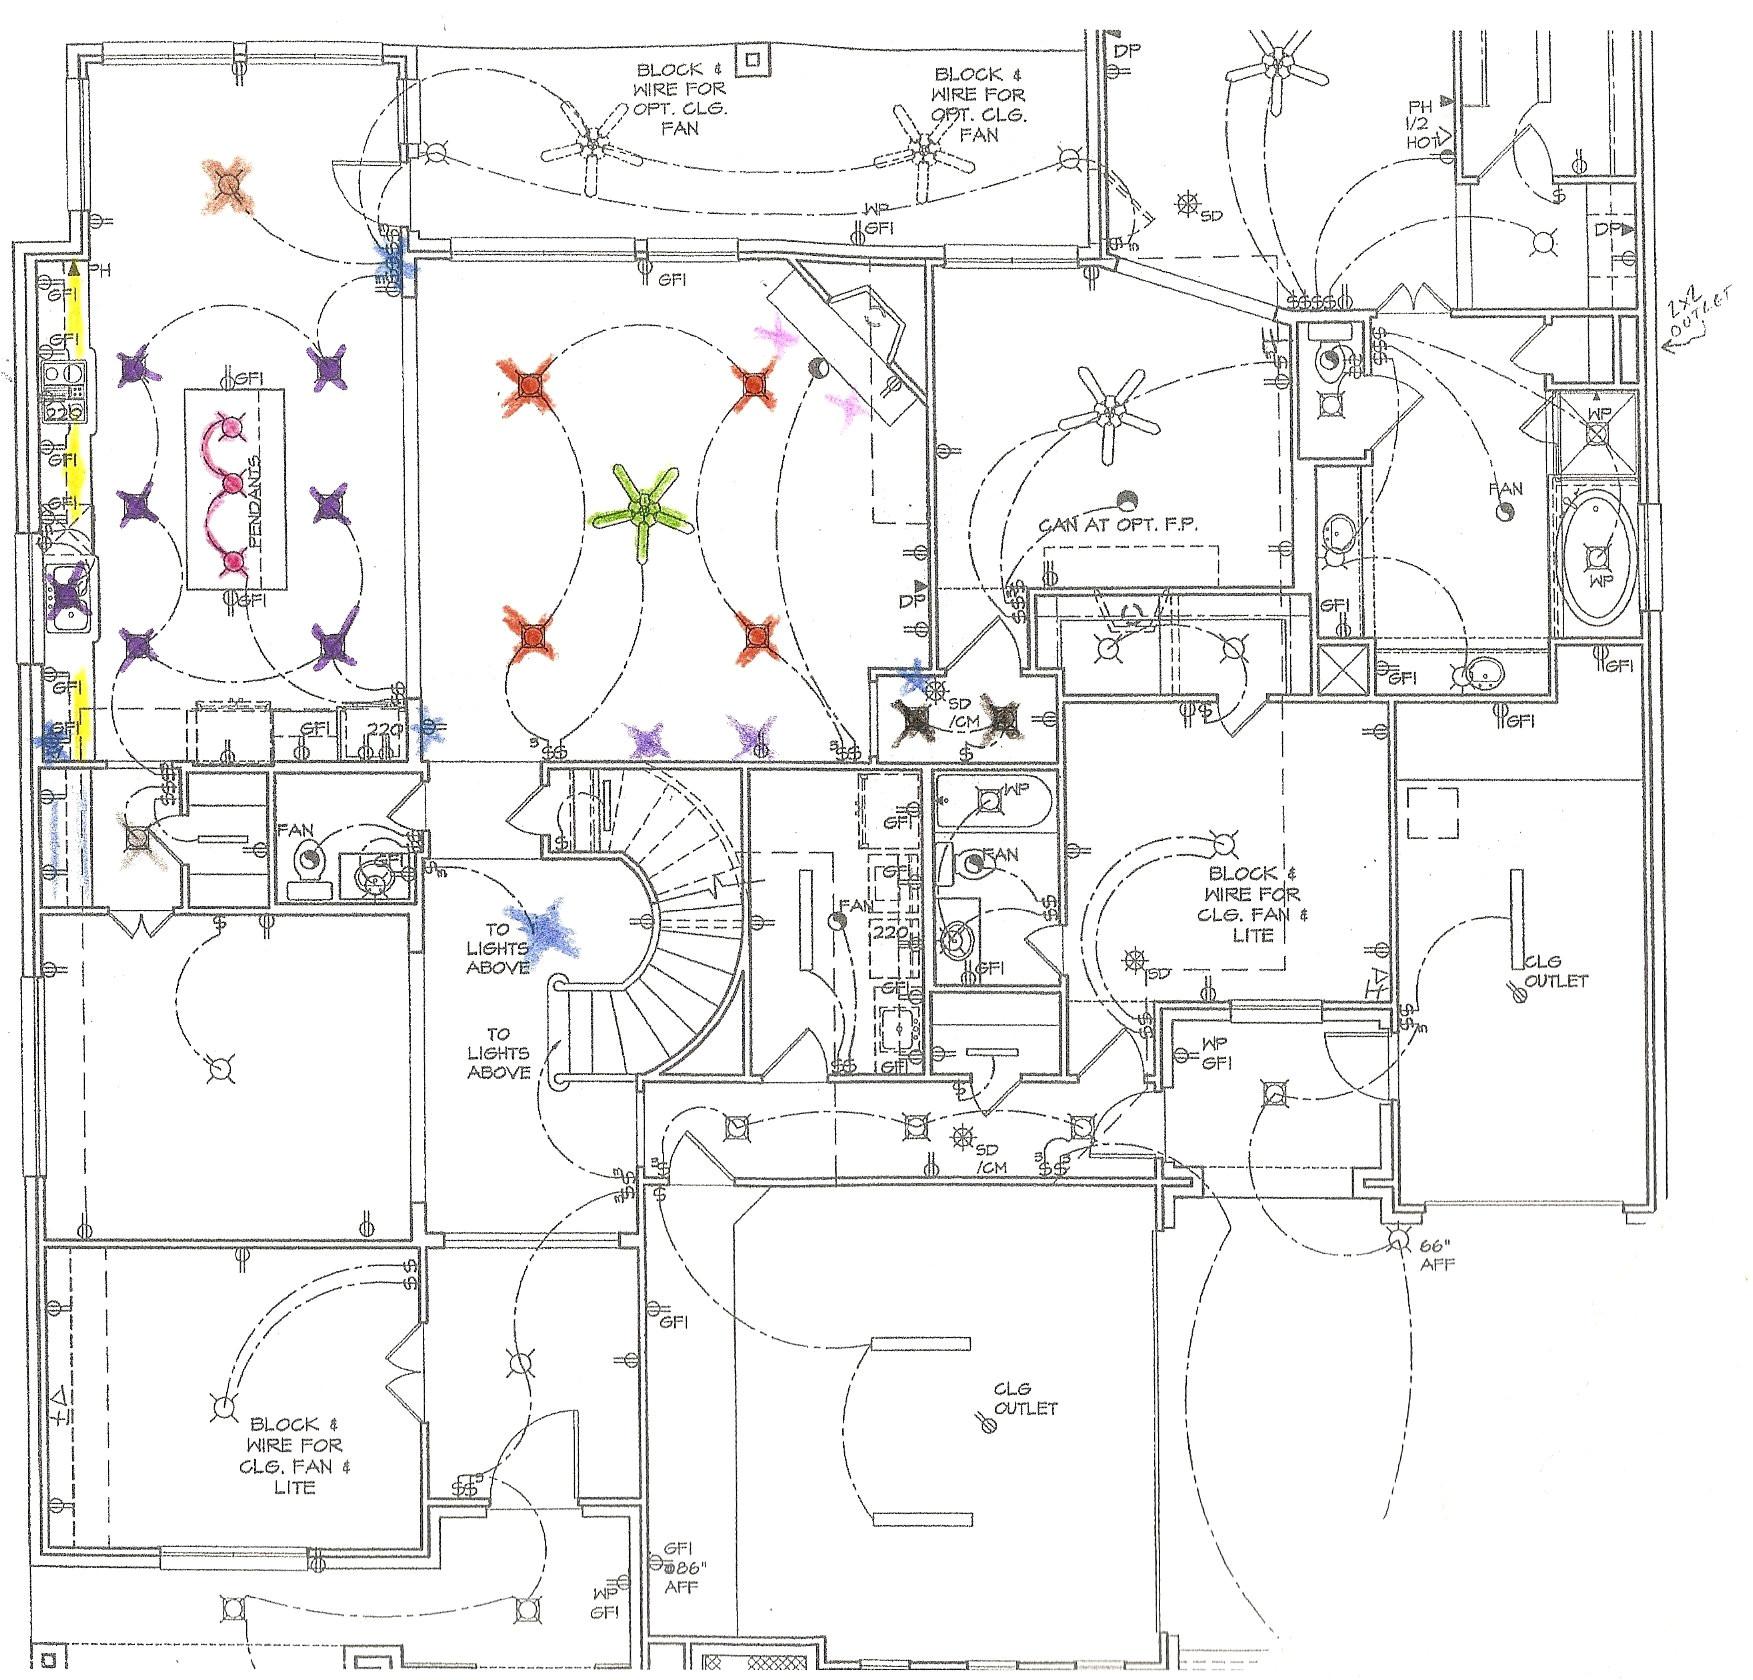 Home Lighting Plan Jandjw